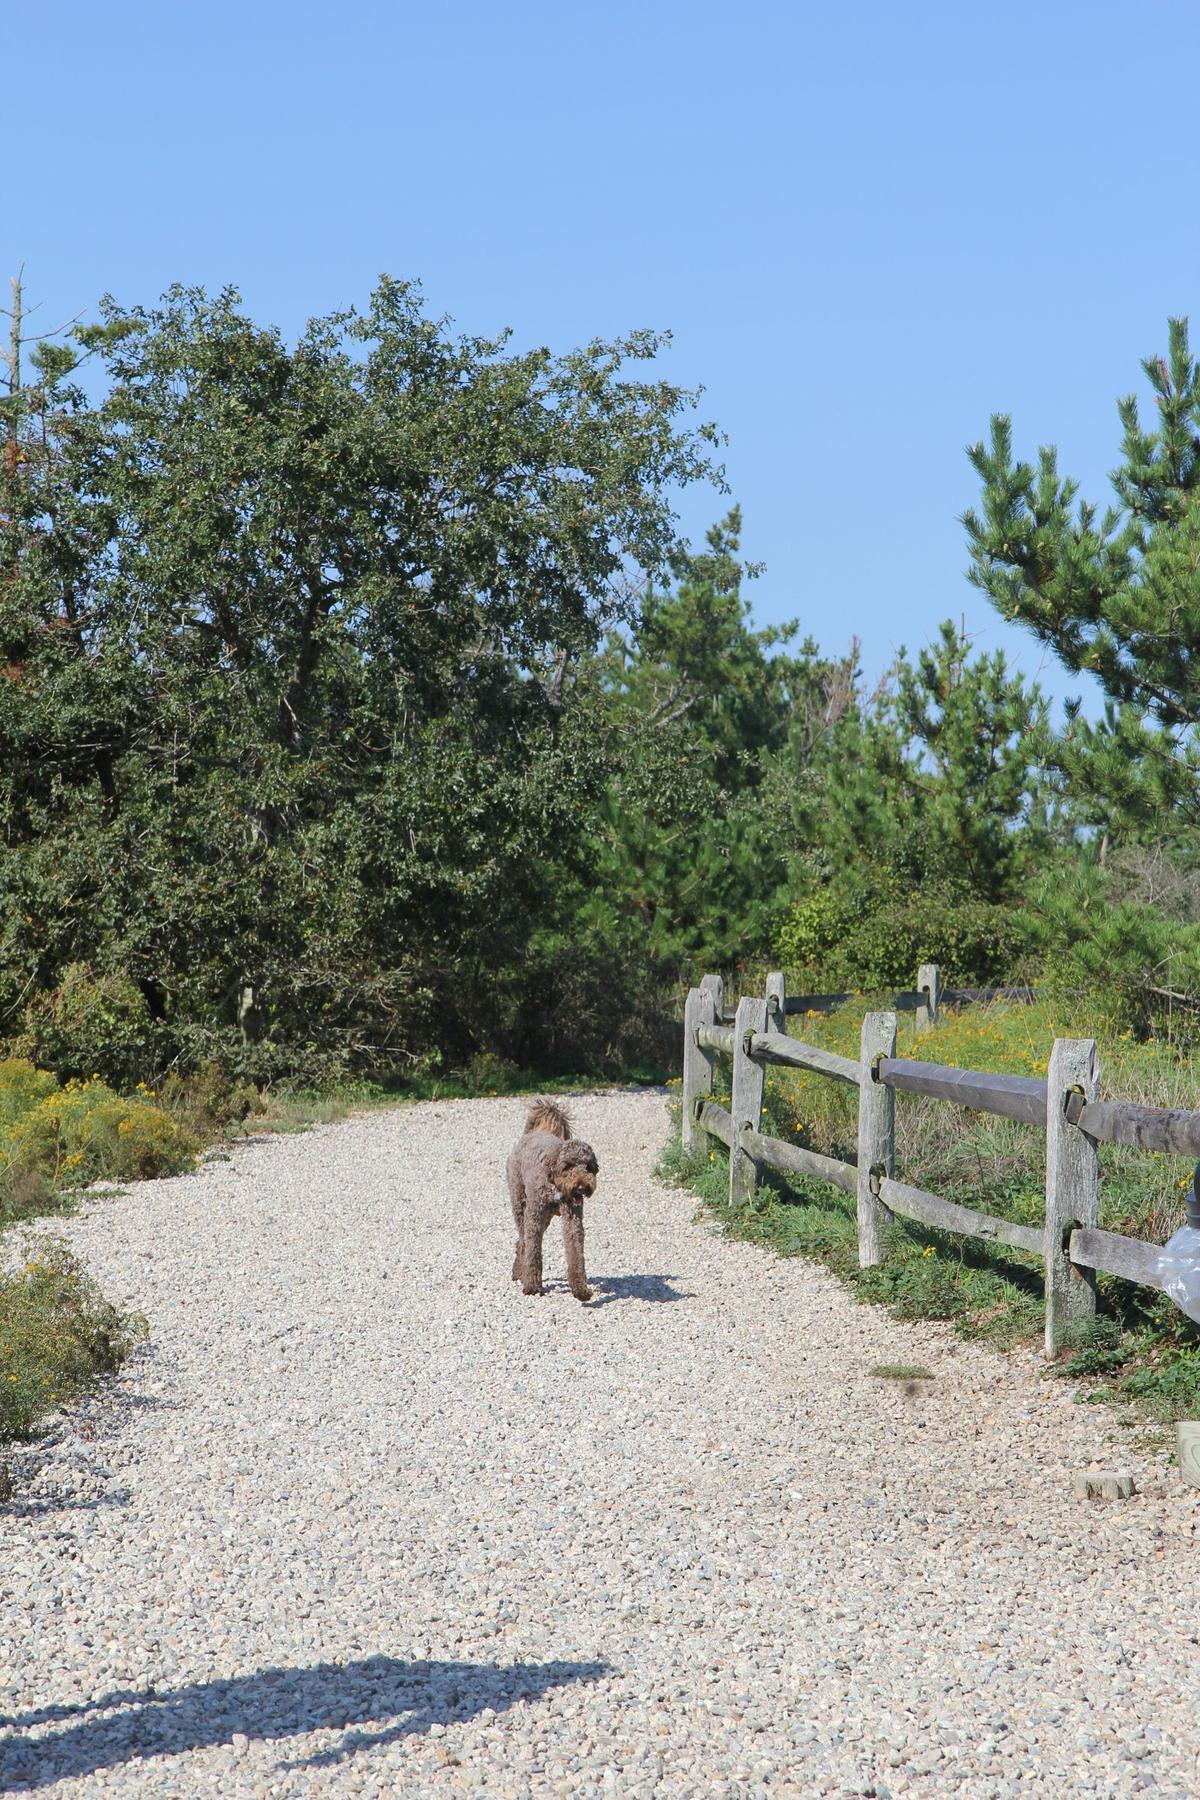 Tupancy Links allows dogs